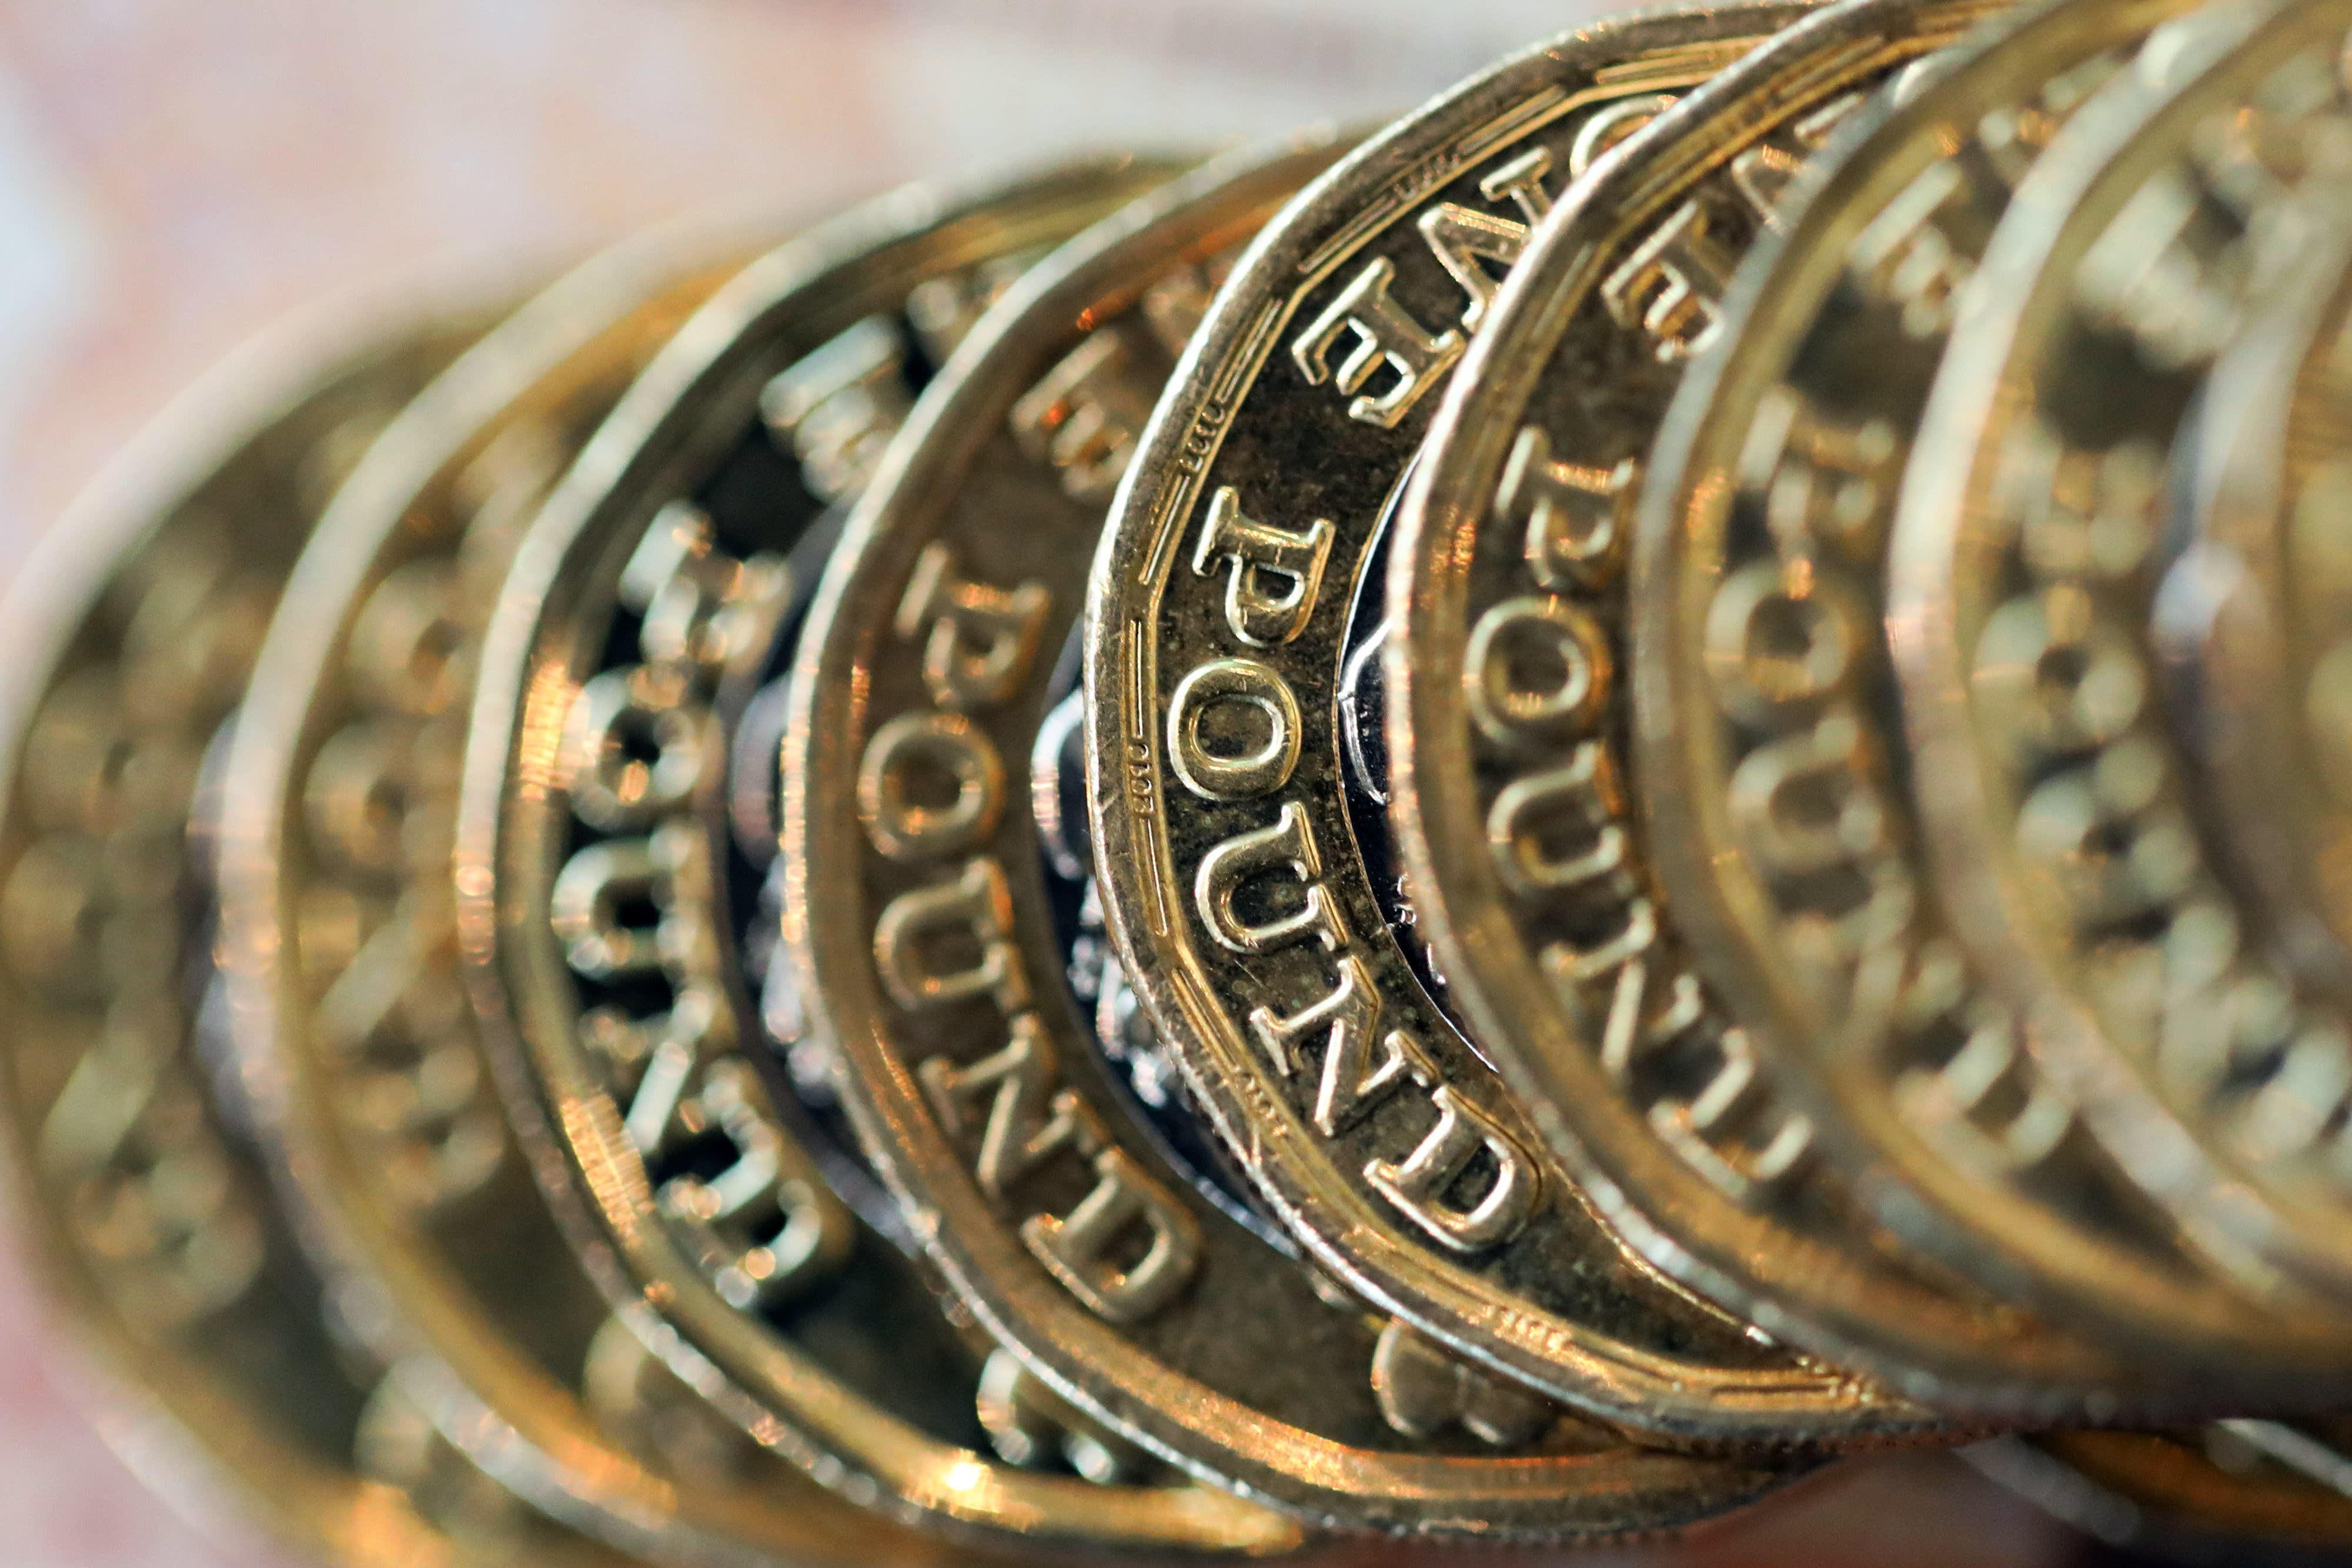 New-entrant consolidator passes £1bn milestone